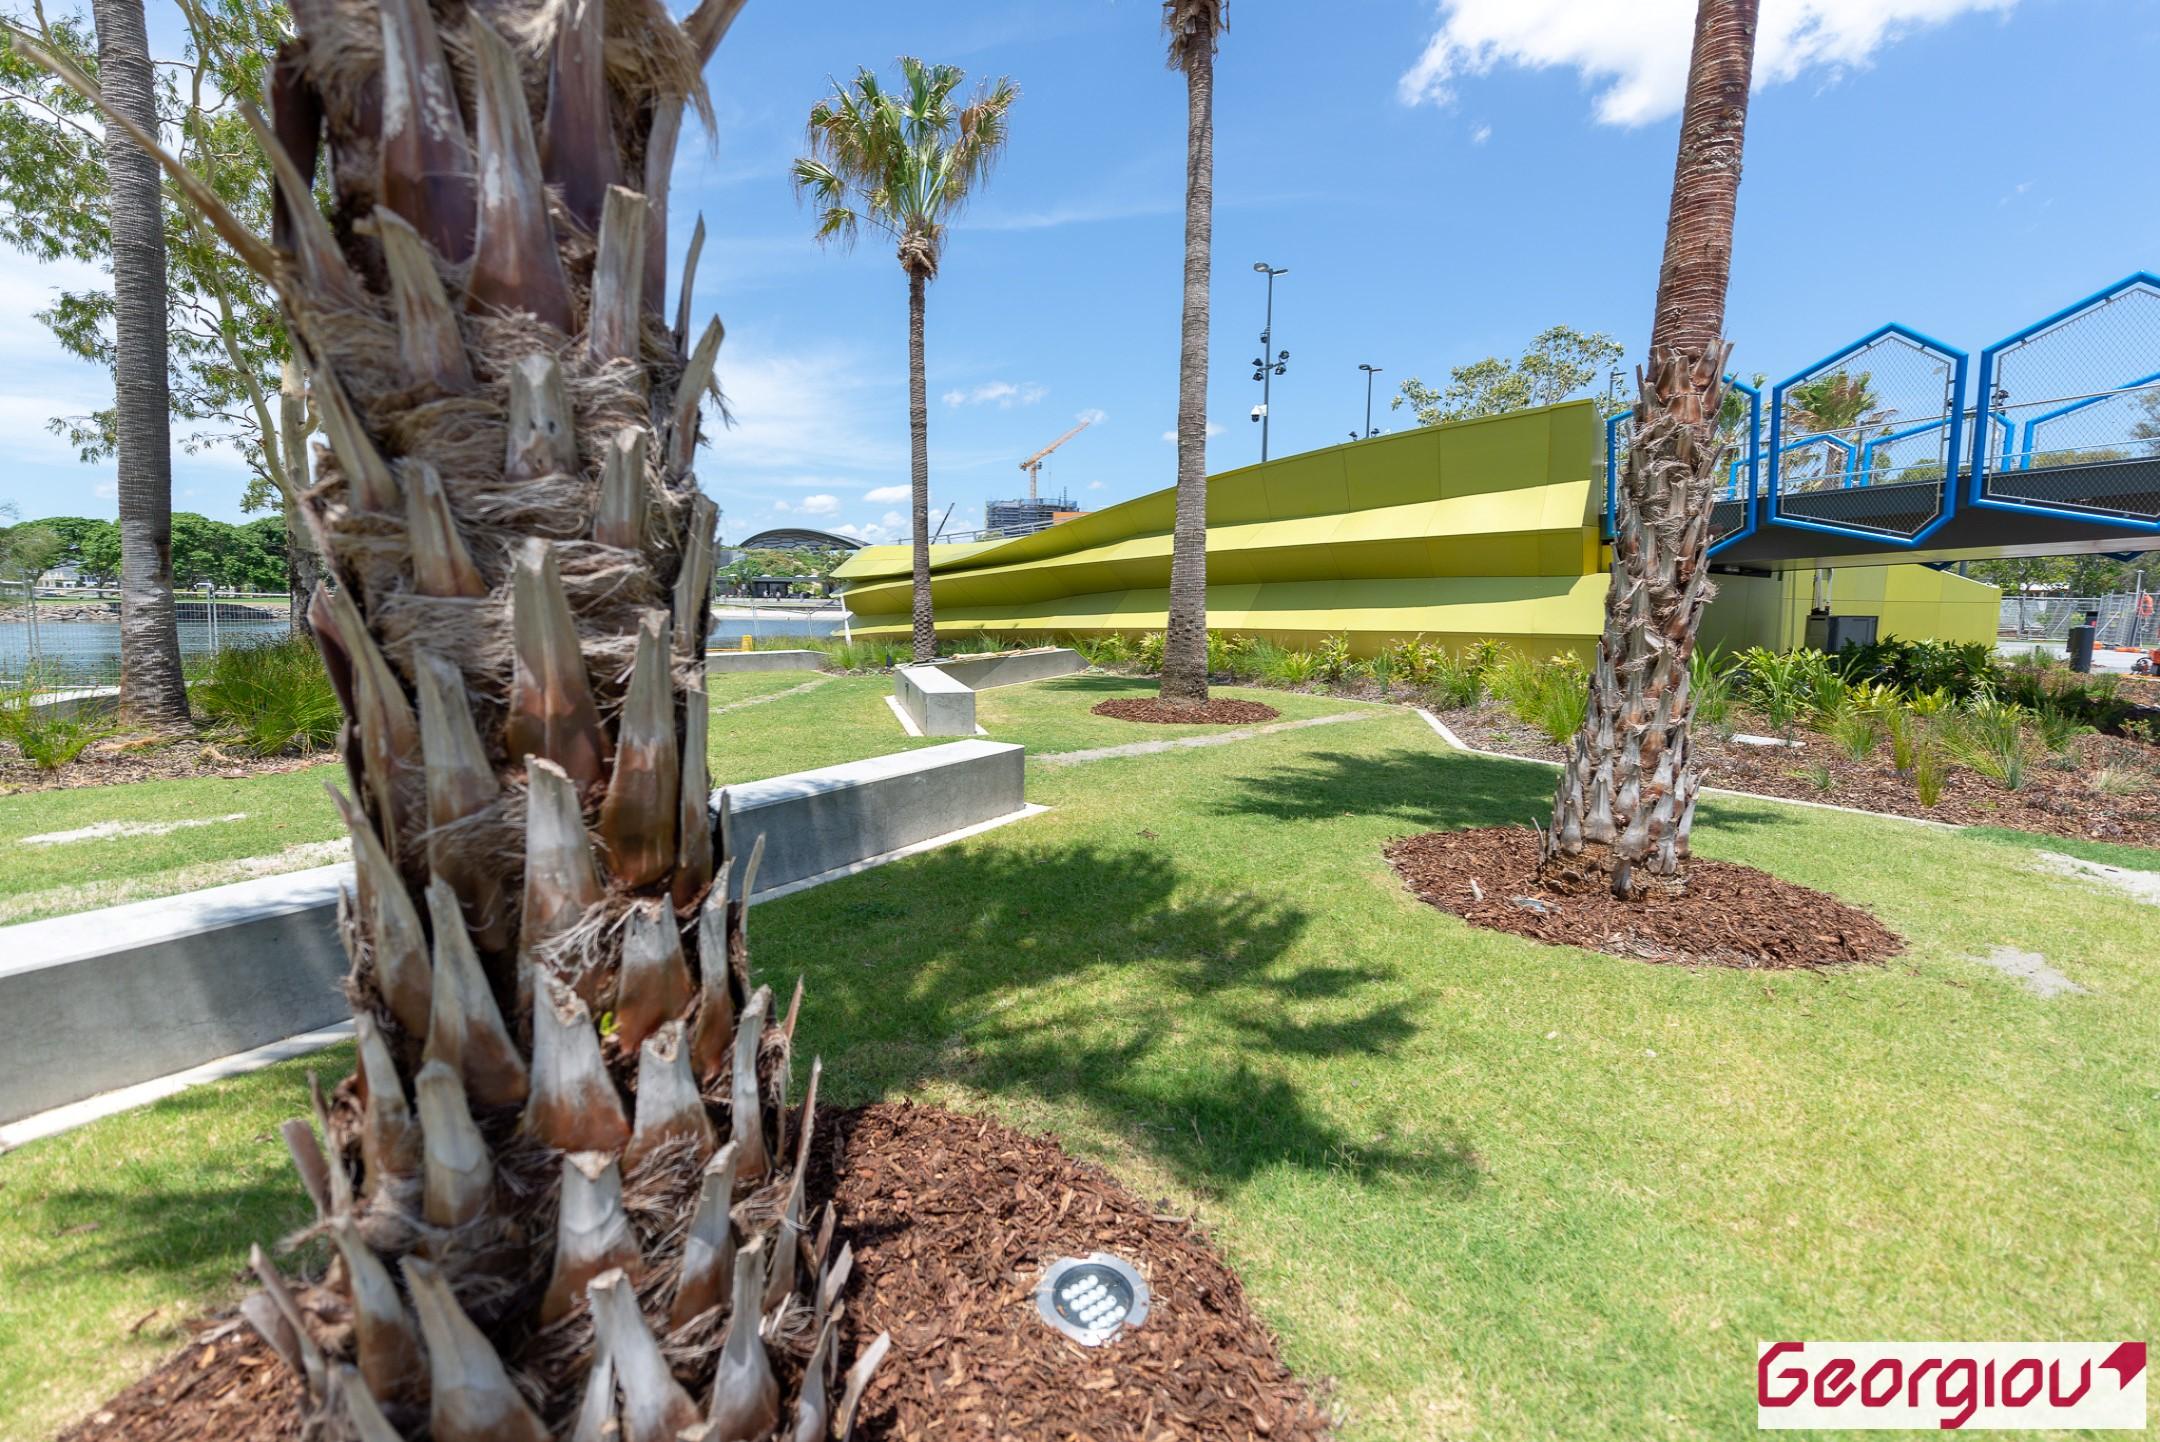 Beautiful parklands at the Green Bridge adjacent the Gold Coast Arts Centre. Professional Photographers by Rapax Construction Photography